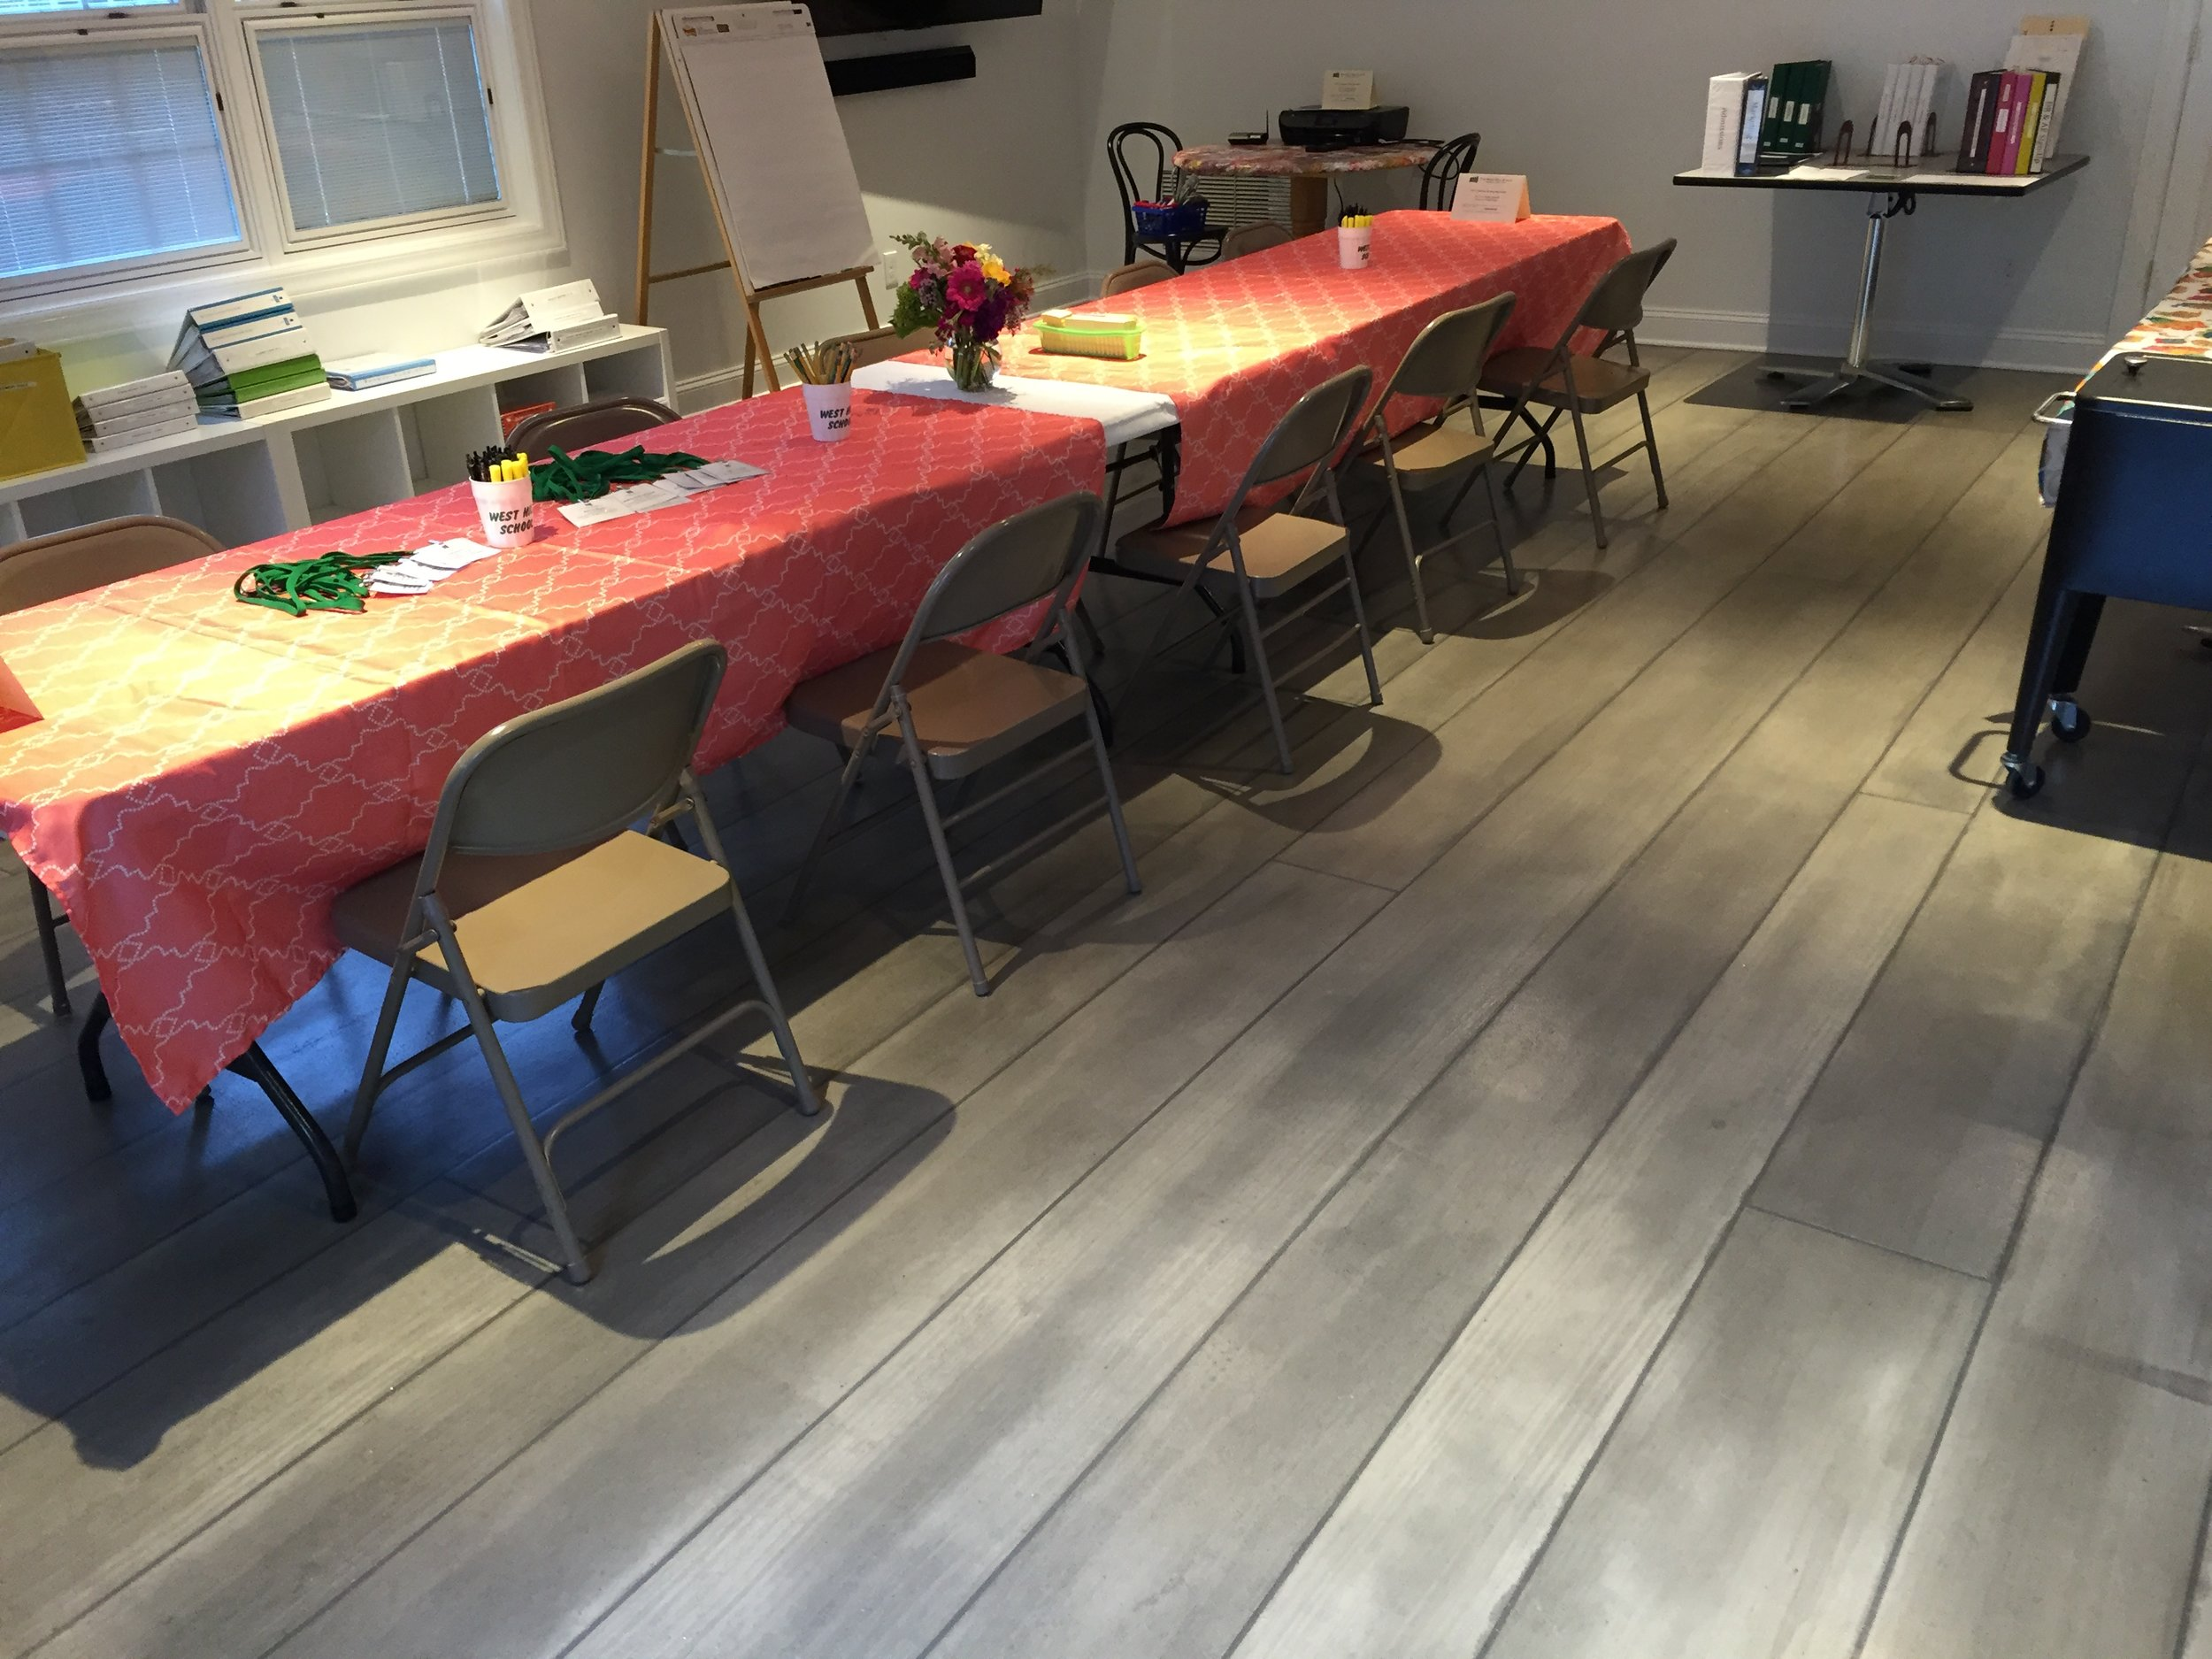 Rustic Concrete Wood Classroom - Bryn Mawr, PA